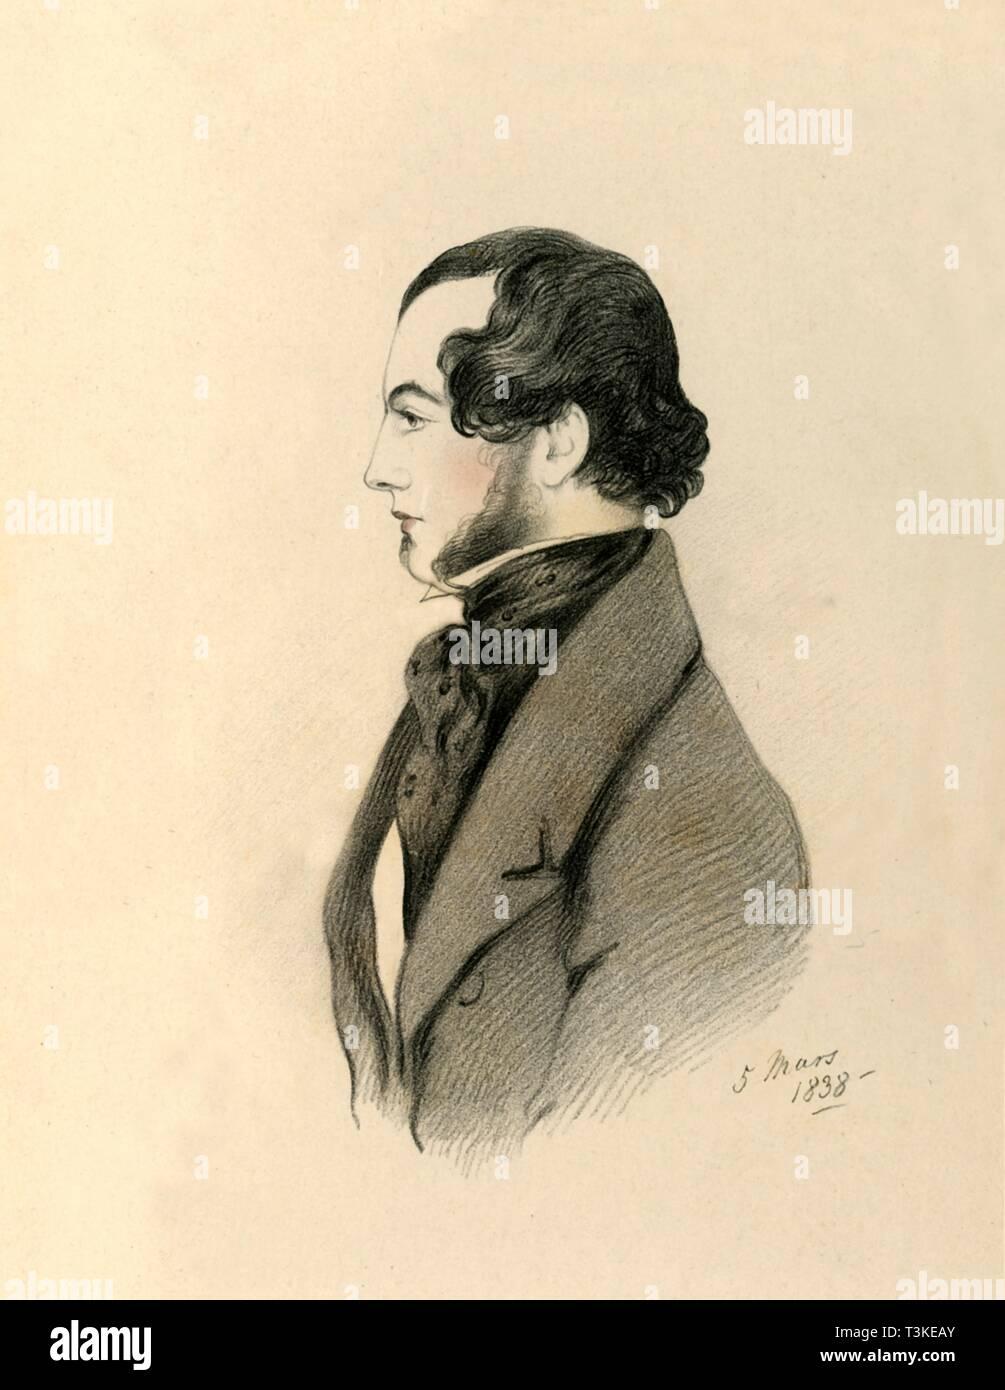 'J Home Purves', 1838. Creator: Richard James Lane. - Stock Image